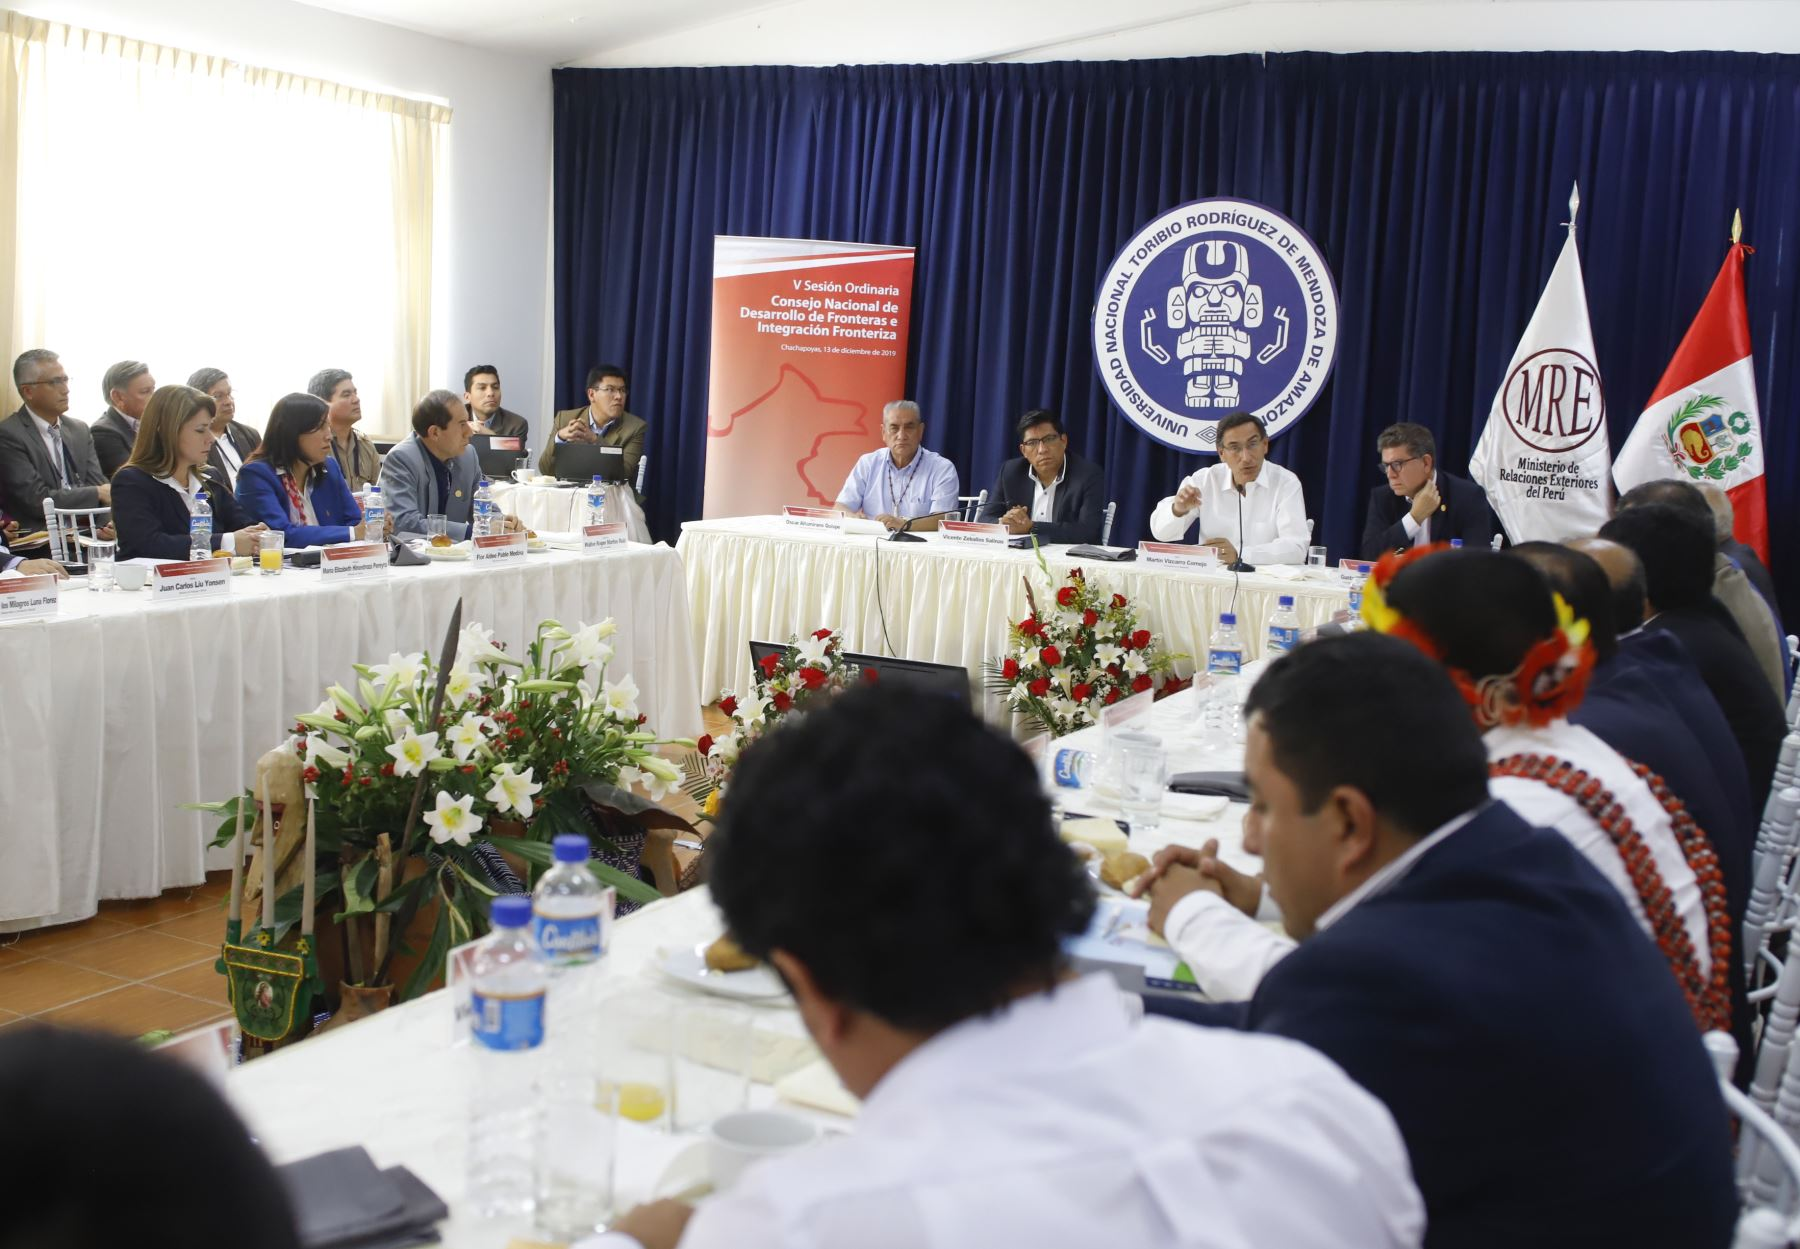 V Sesión Ordinaria del Consejo Nacional de Desarrollo de fronteras e integración fronteriza  ( CONADIF). Foto: ANDINA/Prensa Presidencia